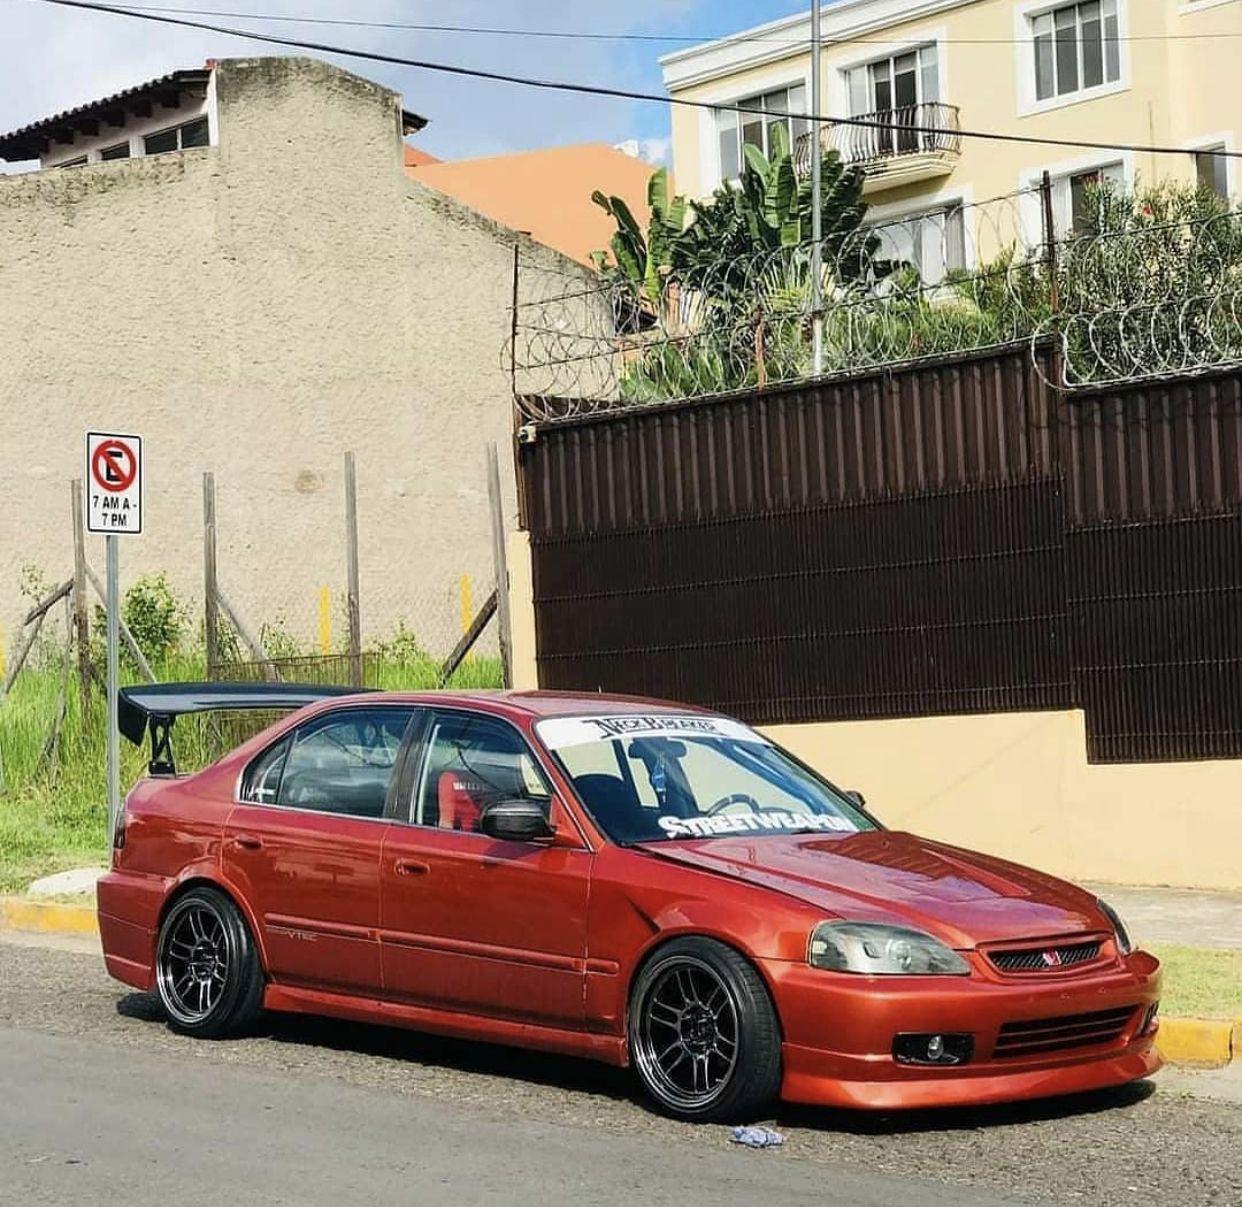 Pin By Eza Revansa On Hot Cars Honda Civic Si Tuner Cars Hot Cars